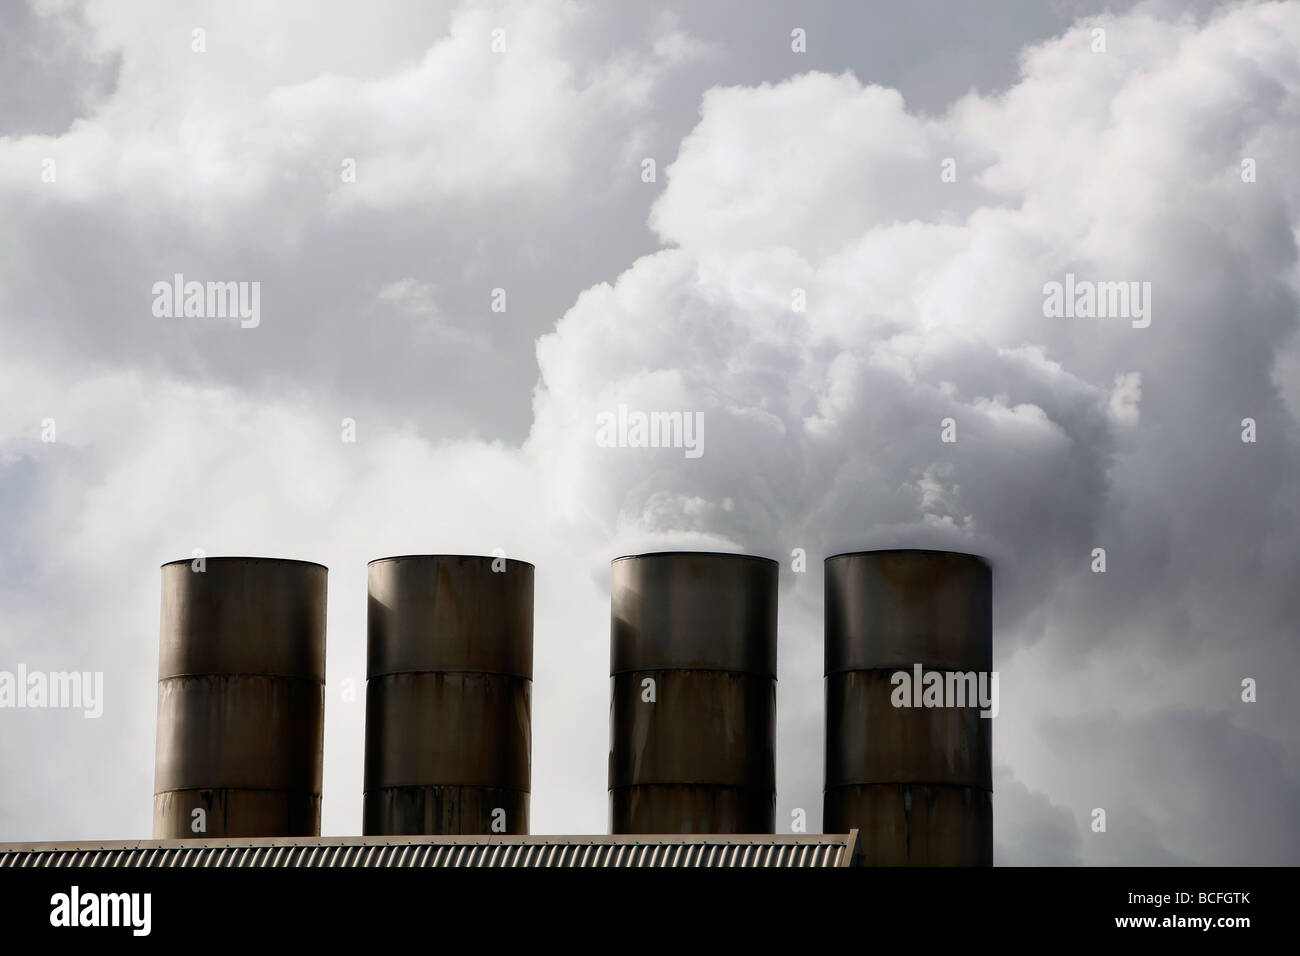 La planta de energía geotérmica de Islandia Imagen De Stock